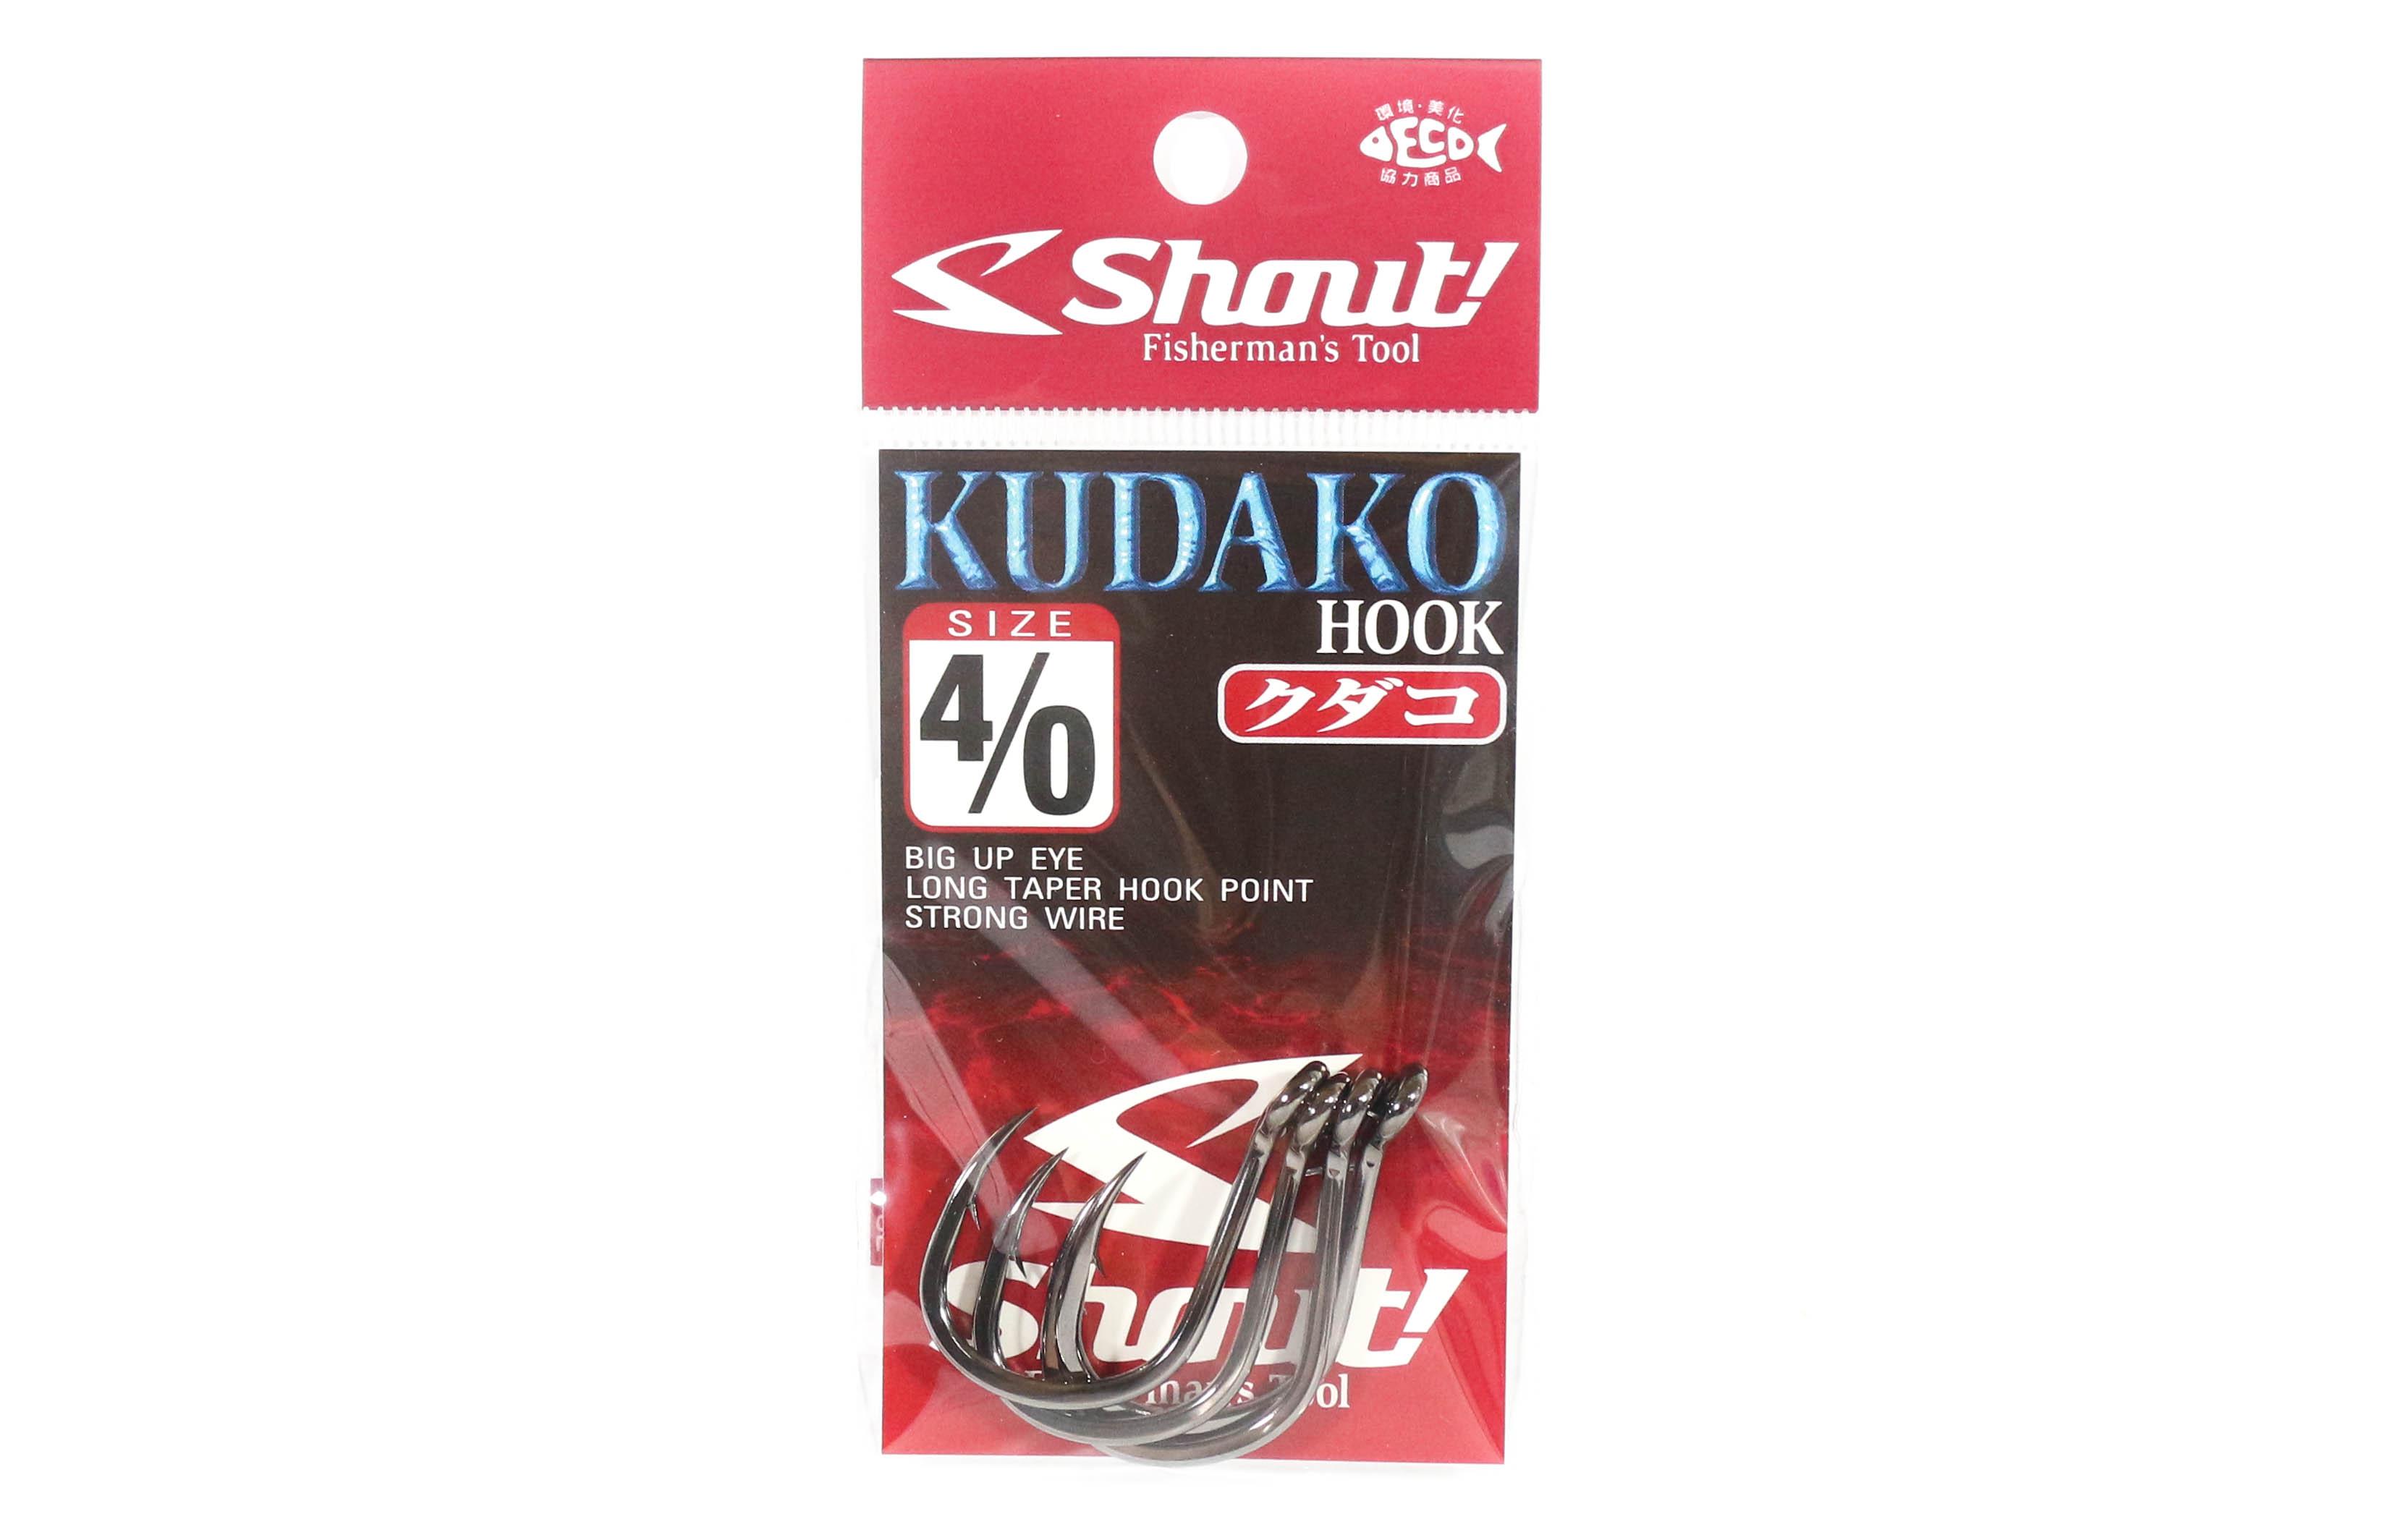 Shout 06-KH Kudako Power Jigging Single Hook Black Size 4/0 (9400)